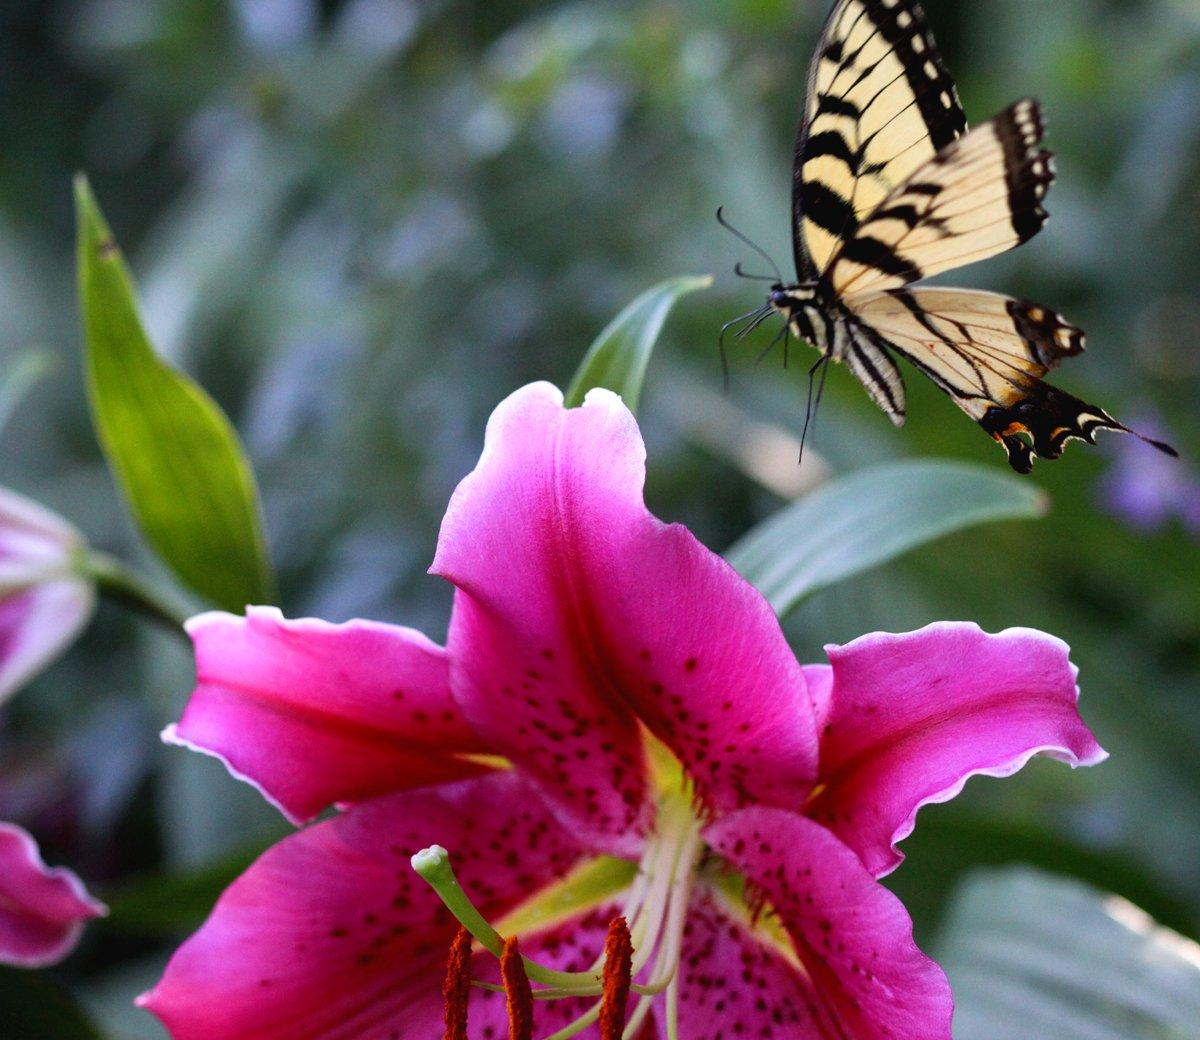 10 000 birds butterfly on flowers for Butterfly on flowers